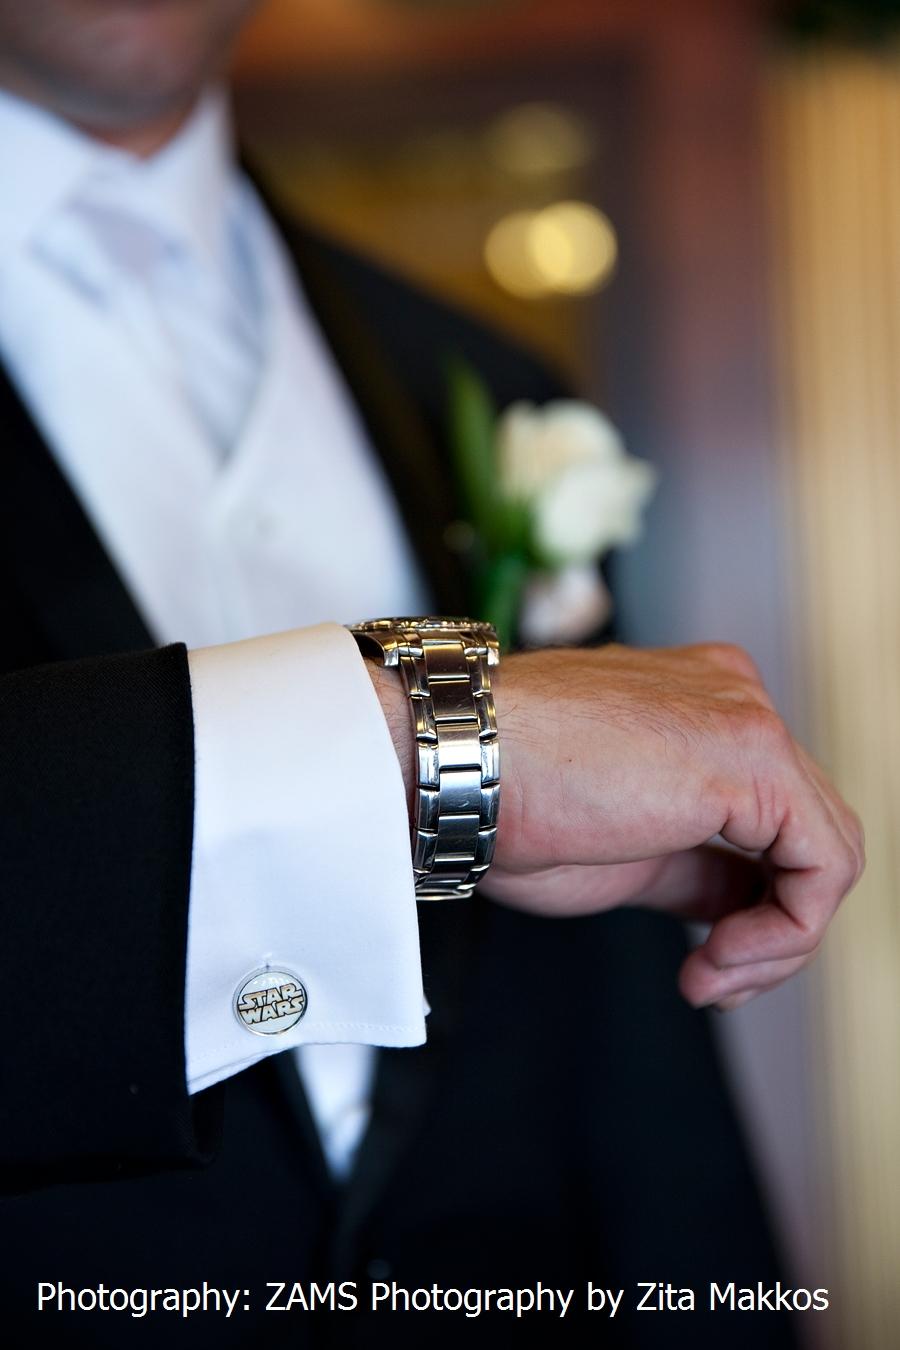 assassins_creed_ezio_cuff_links_men_weddings_gift_cufflinks_2.jpg